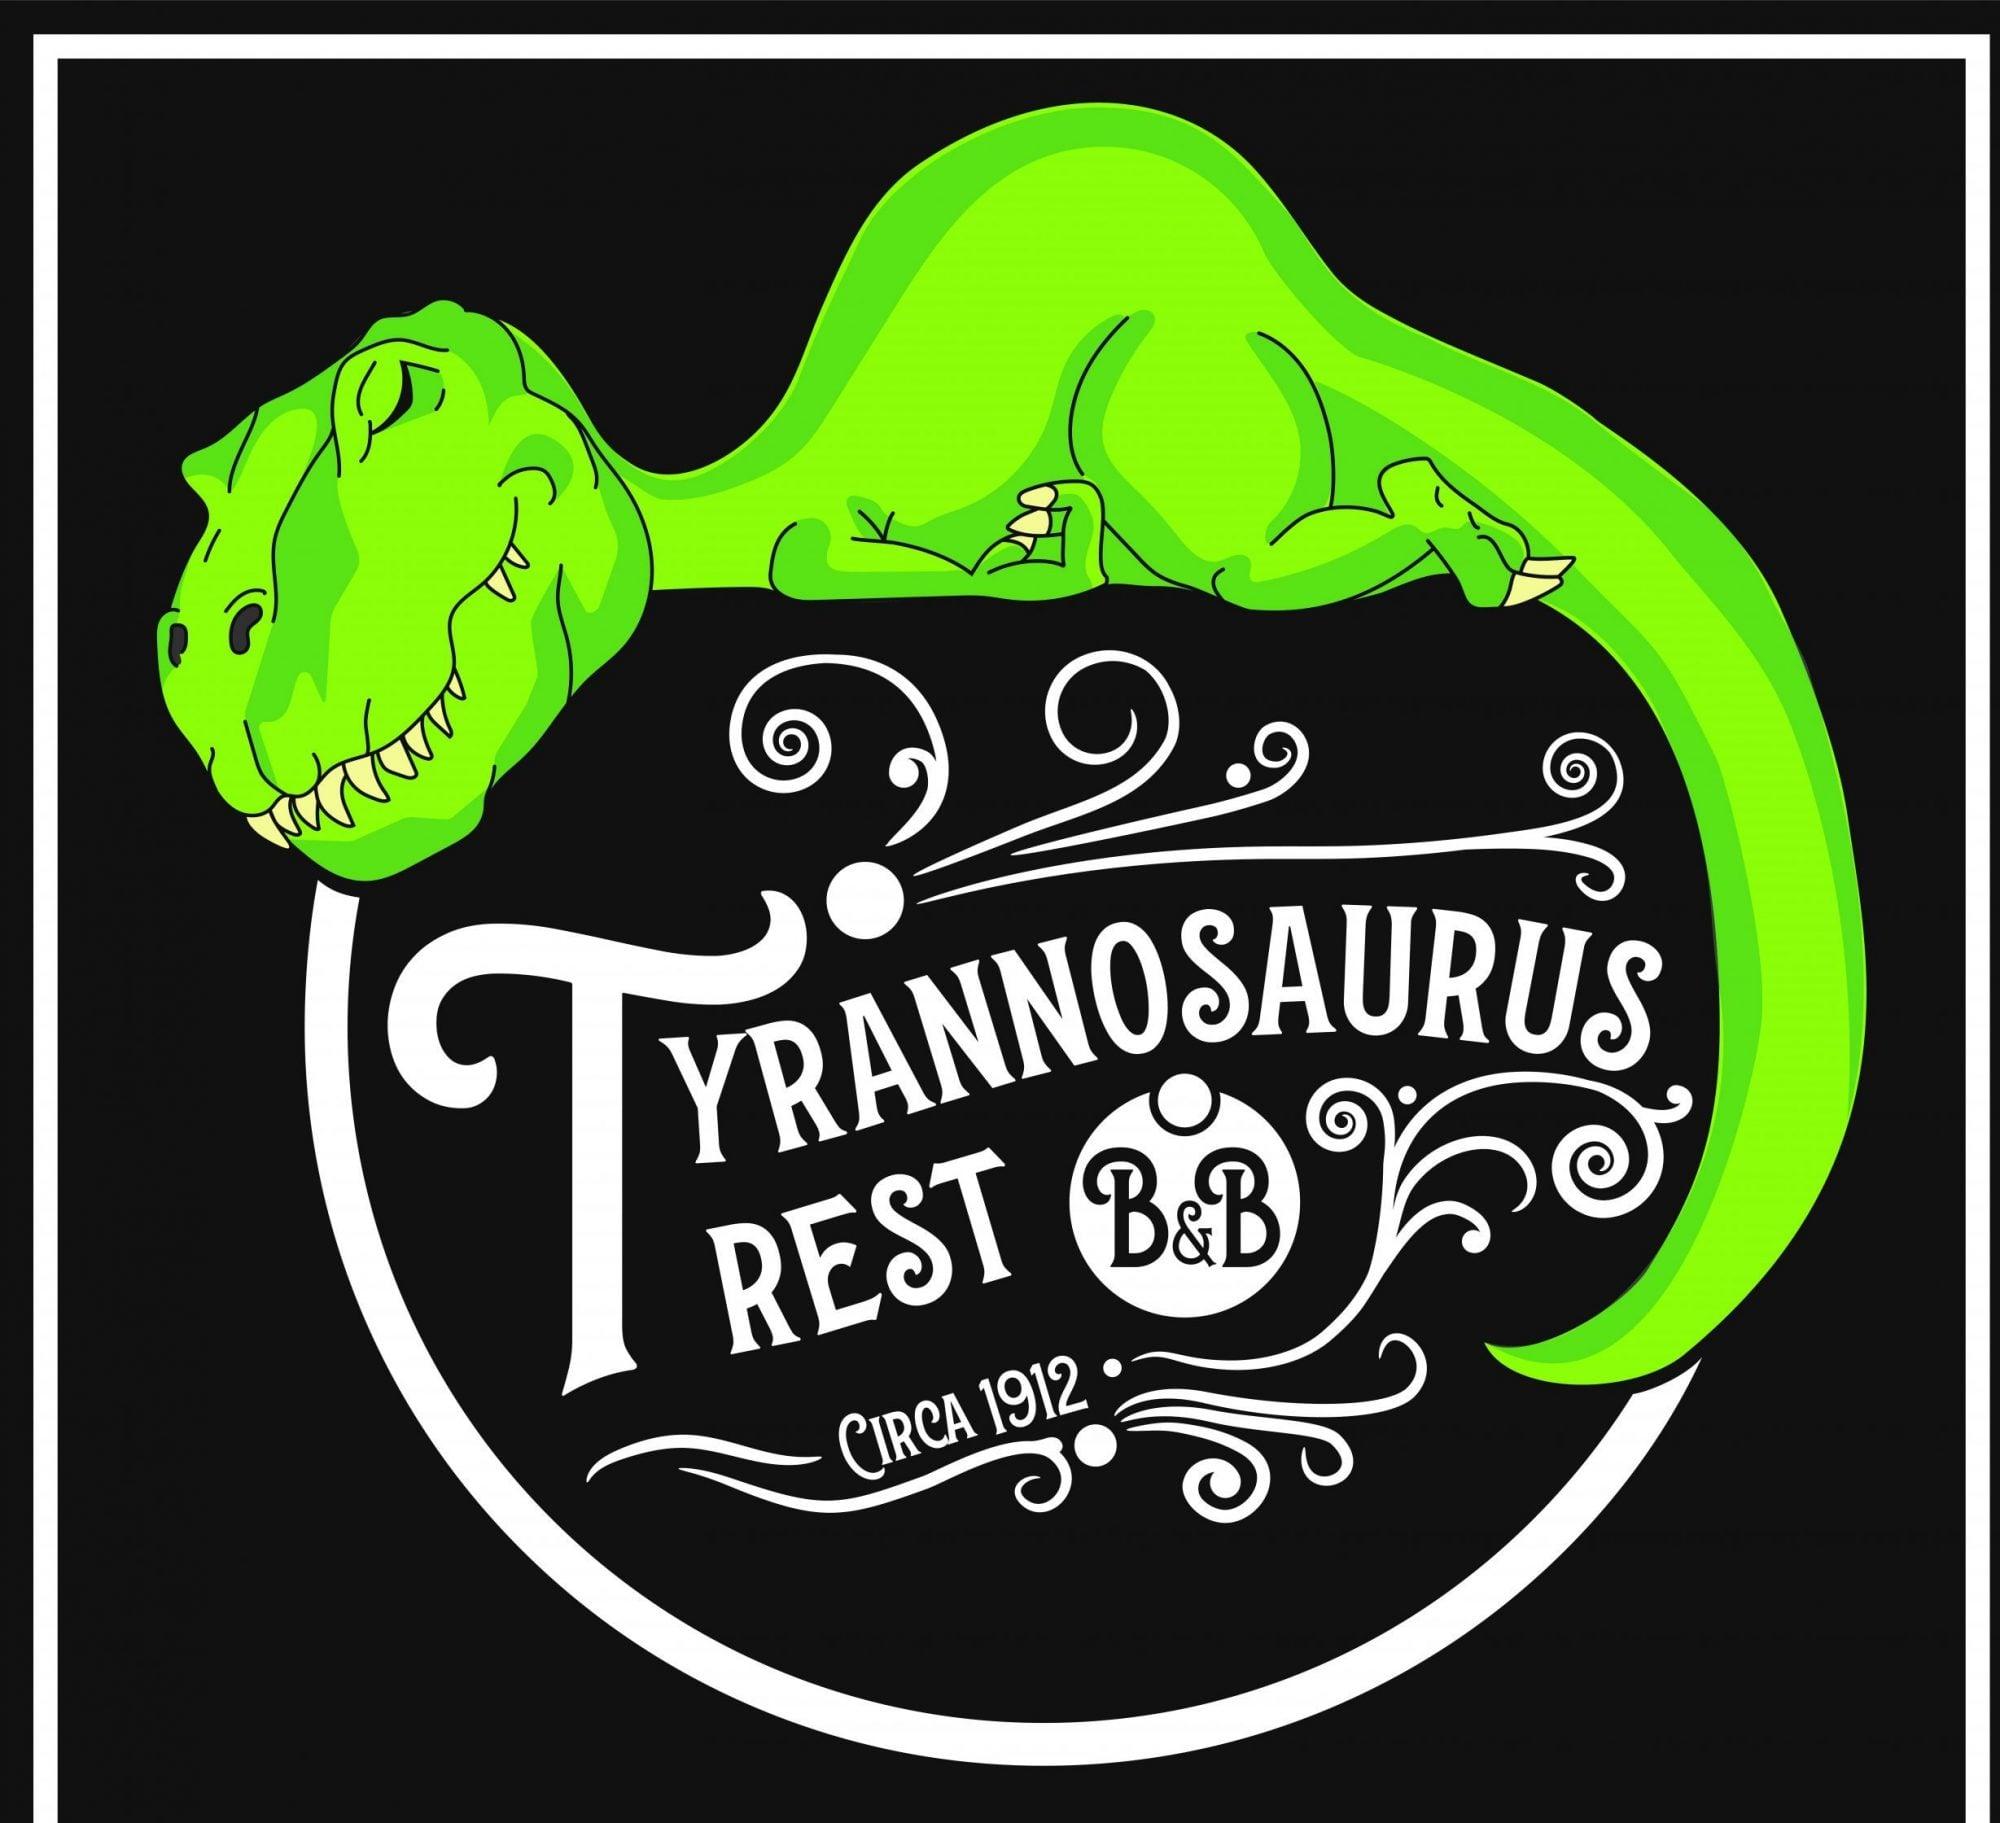 Tyrannosaurus Rest B&B